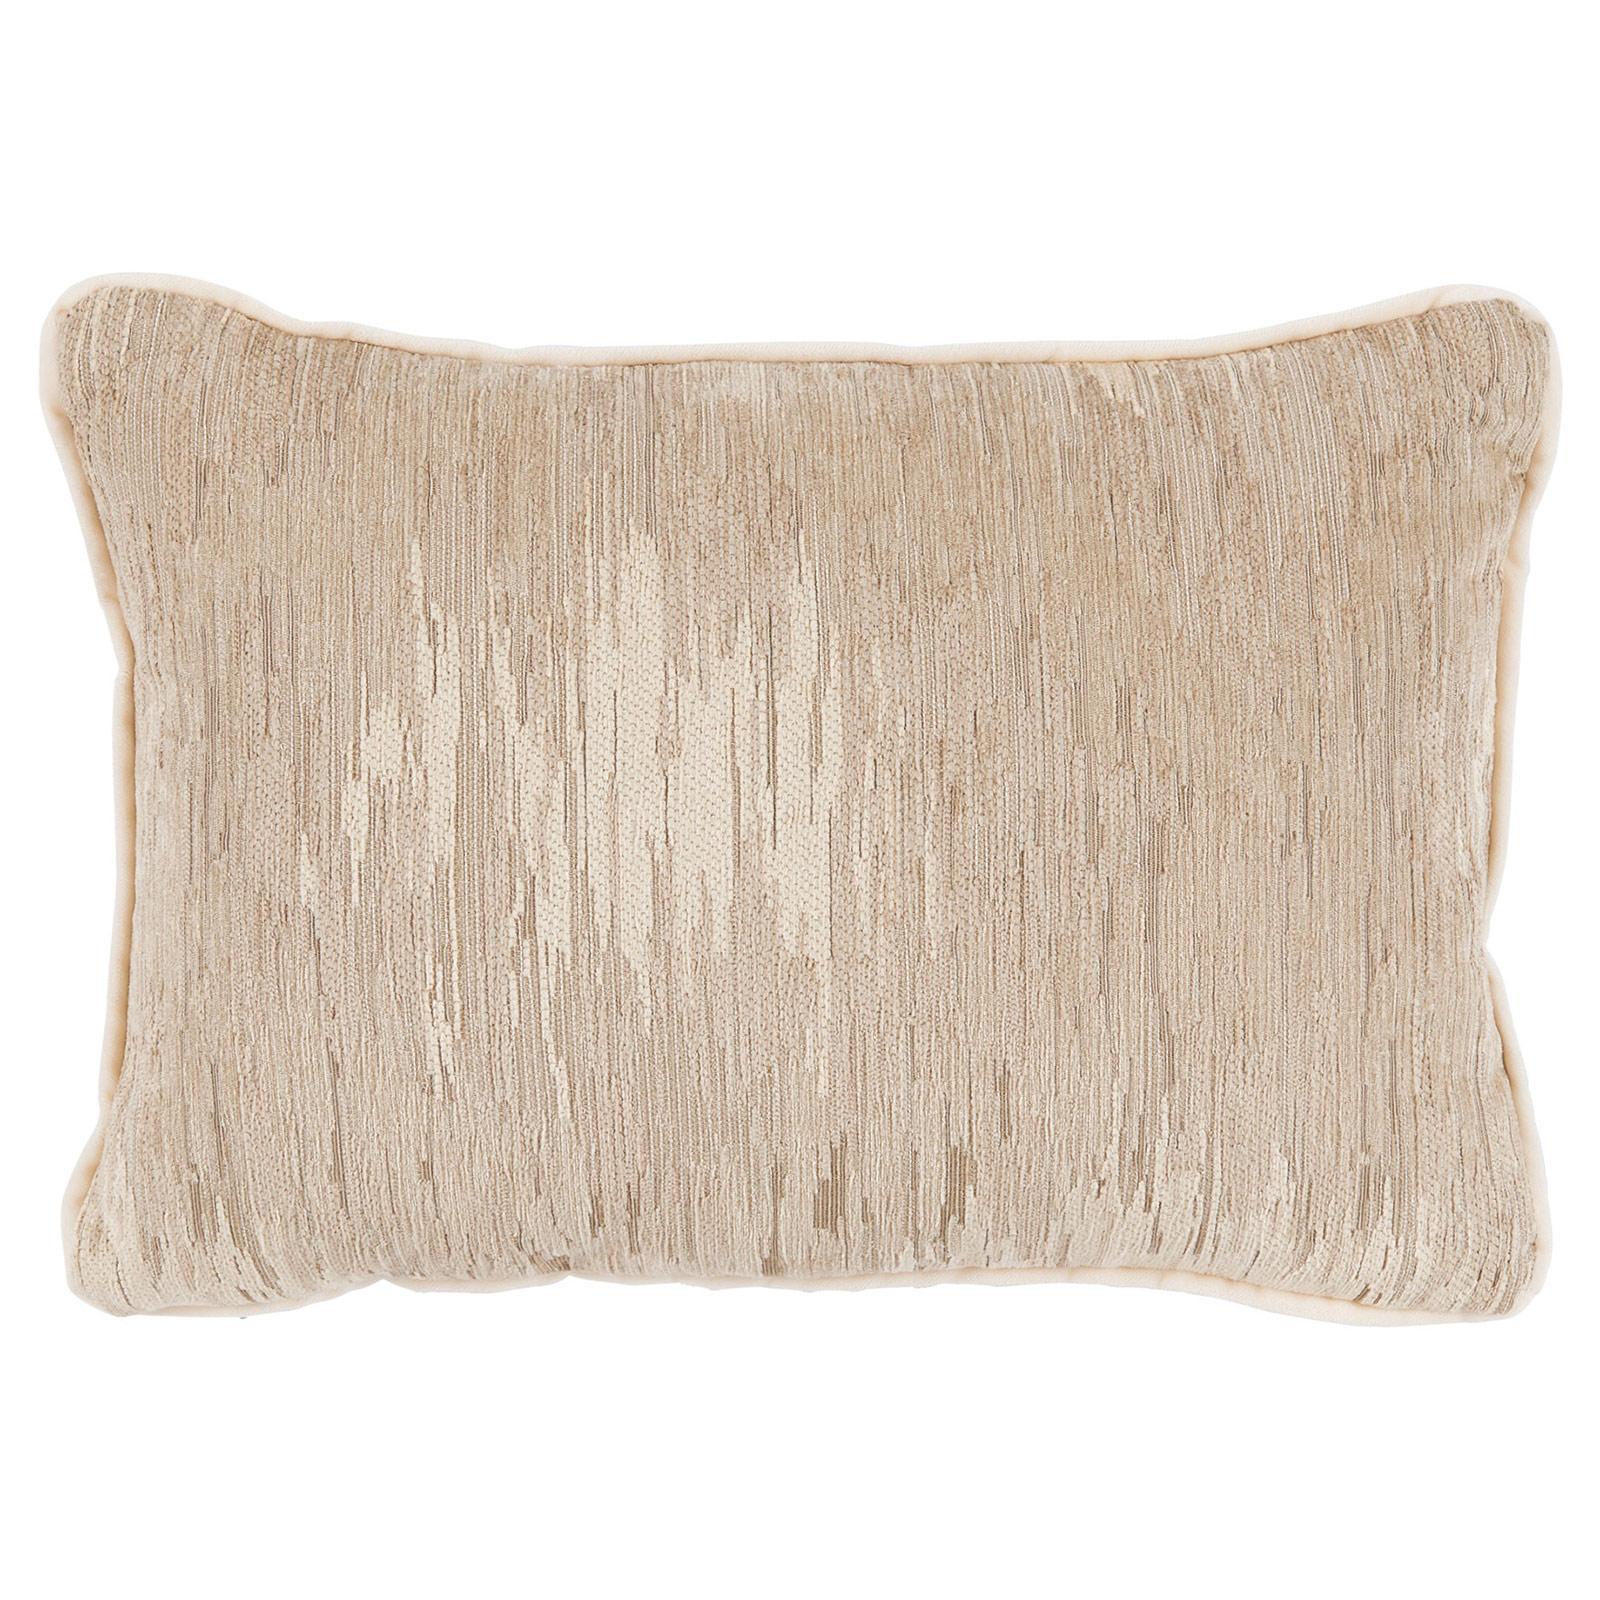 Oz Modern Classic Champagne Beige Linear Pillow - 13x19